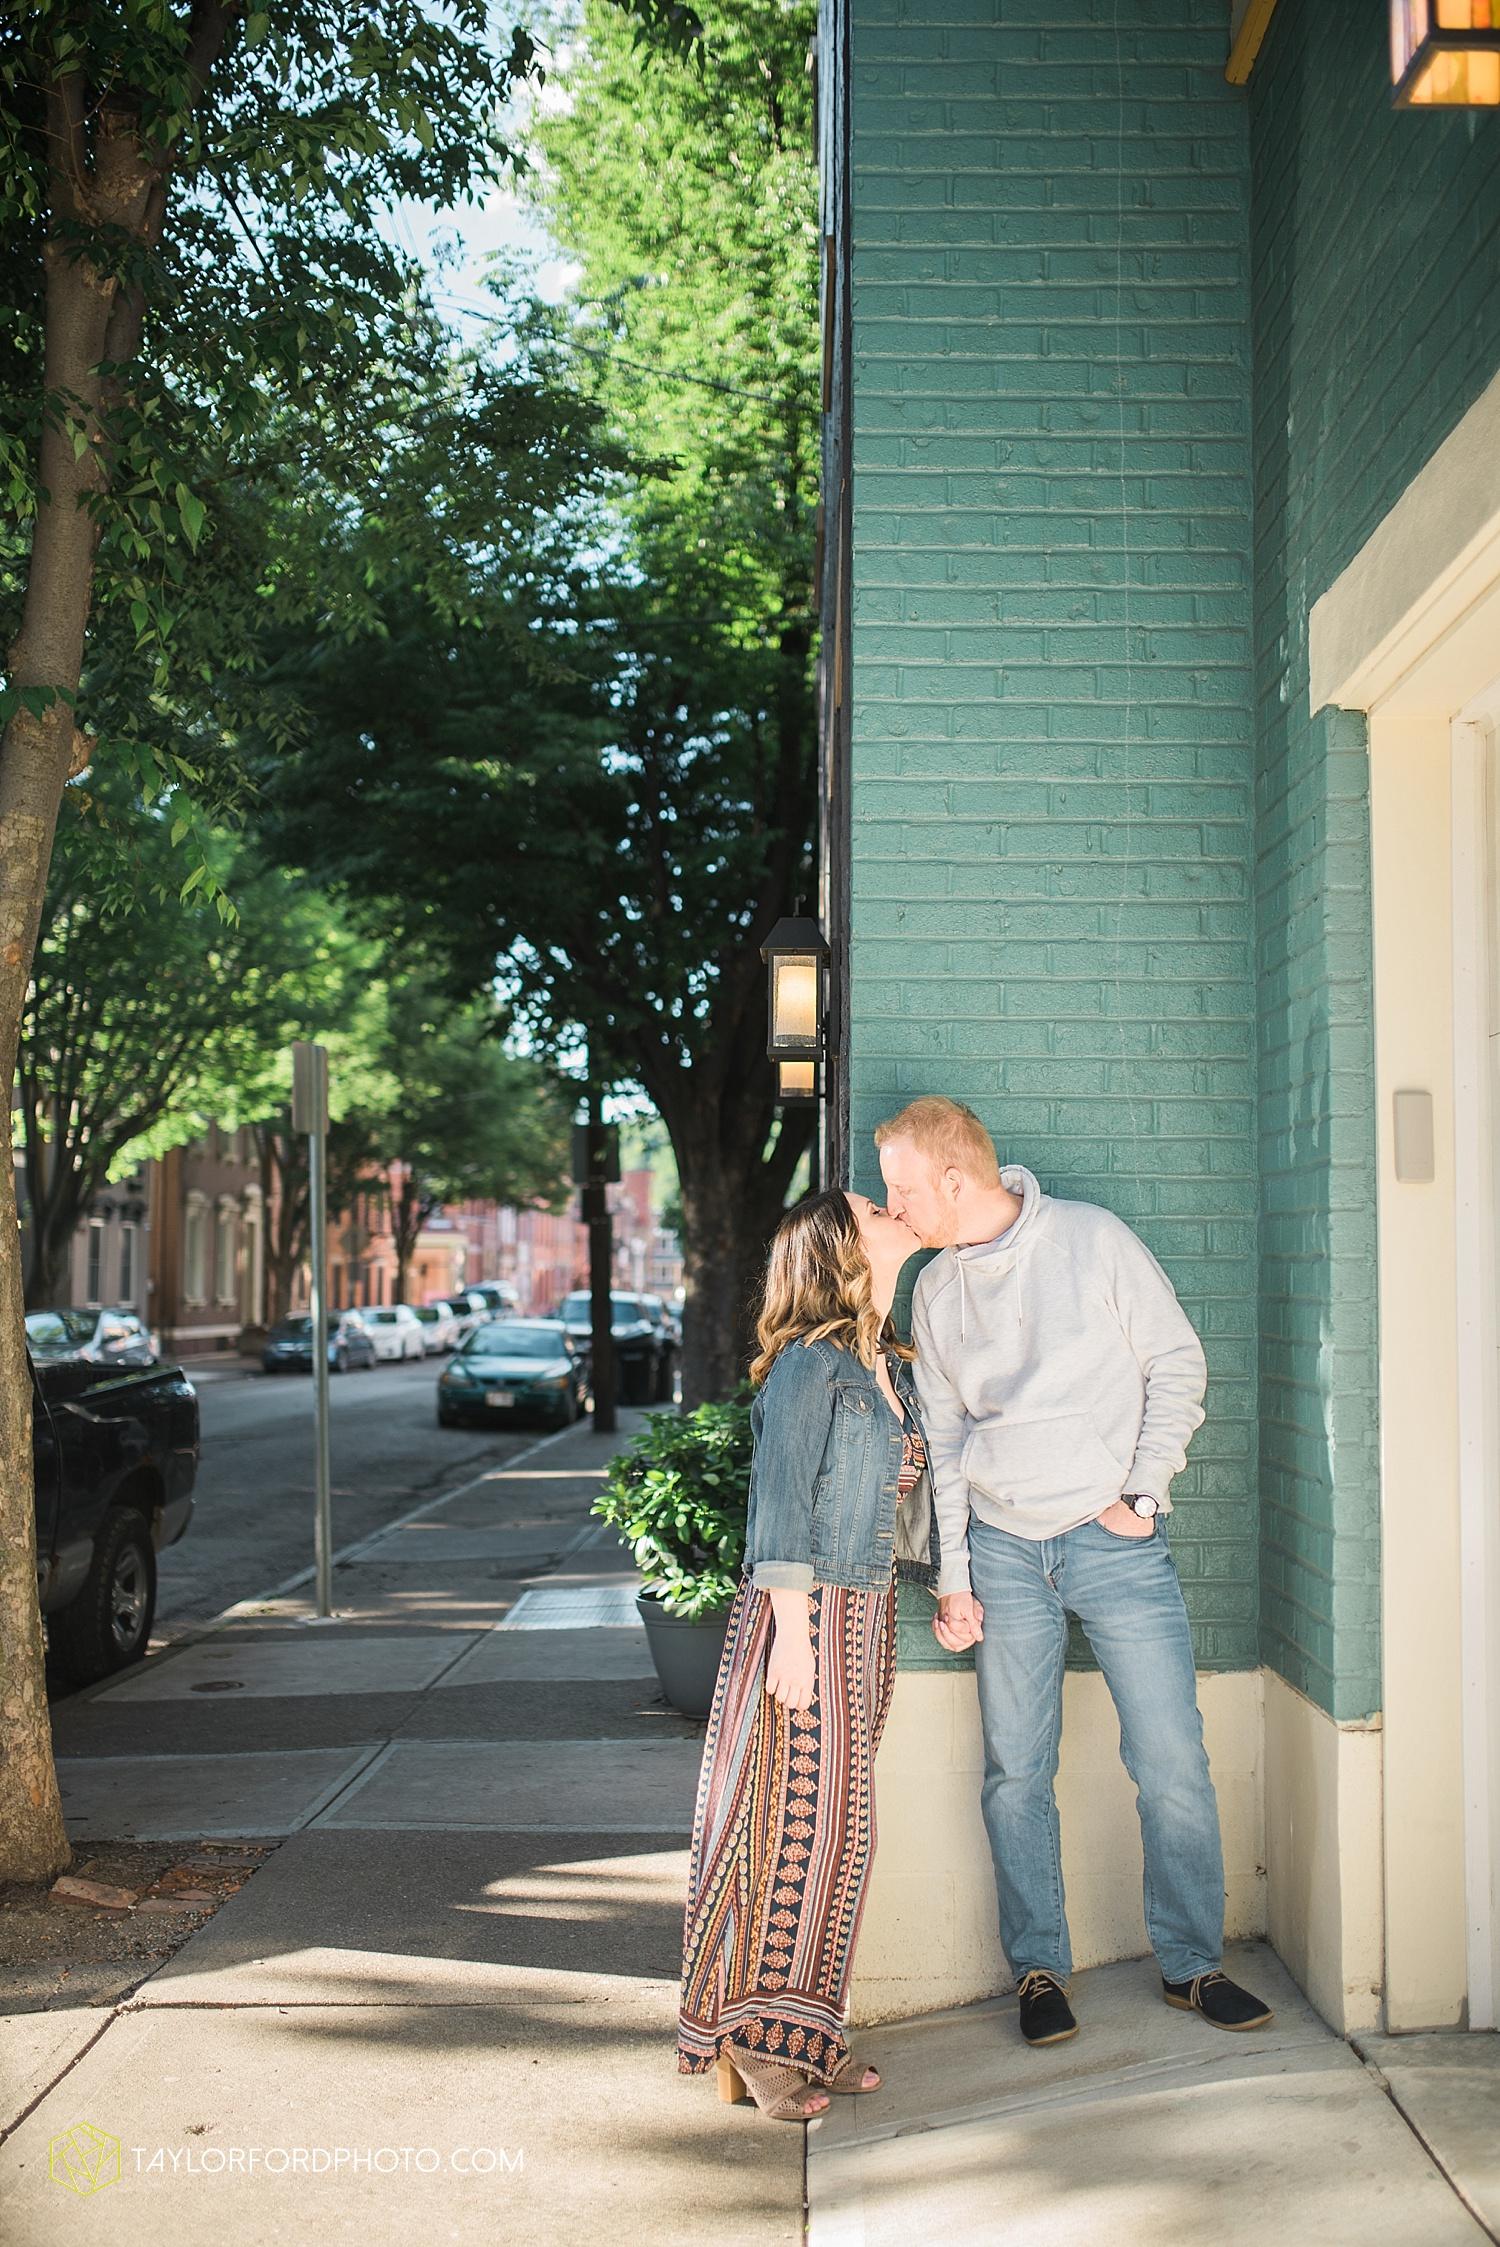 cincinnati-ohio-engagement-wedding-photographer-taylor-ford-photography-over-the-rhine-alms-park_1781.jpg